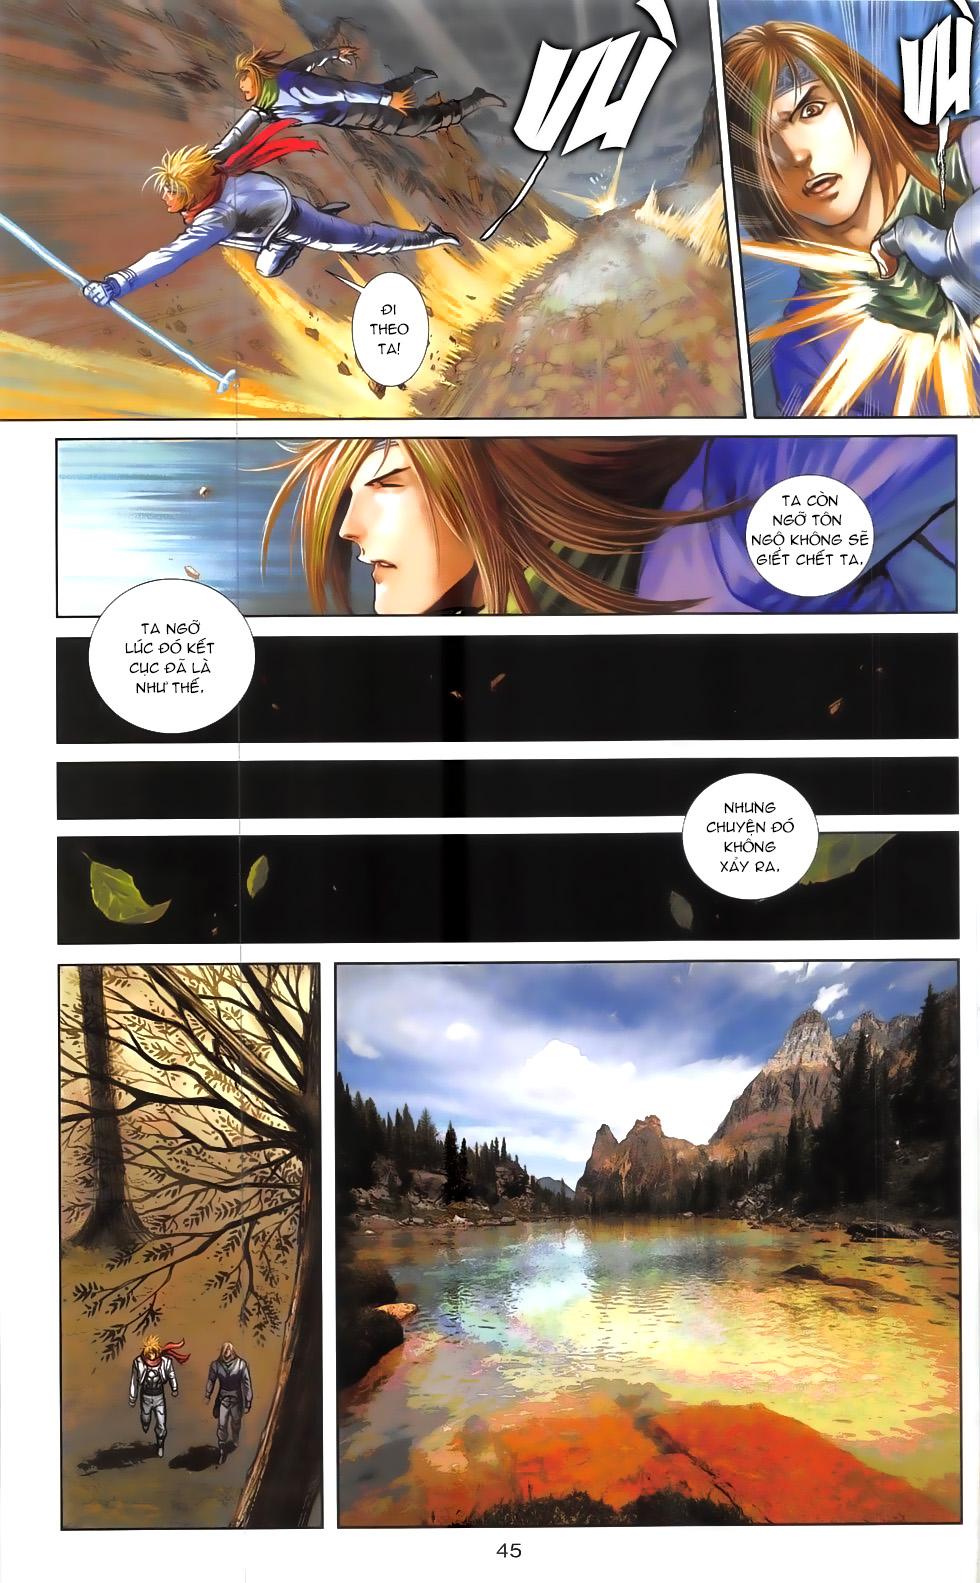 Thần Binh Đấu Giả Chapter 4b - BigTruyen.net